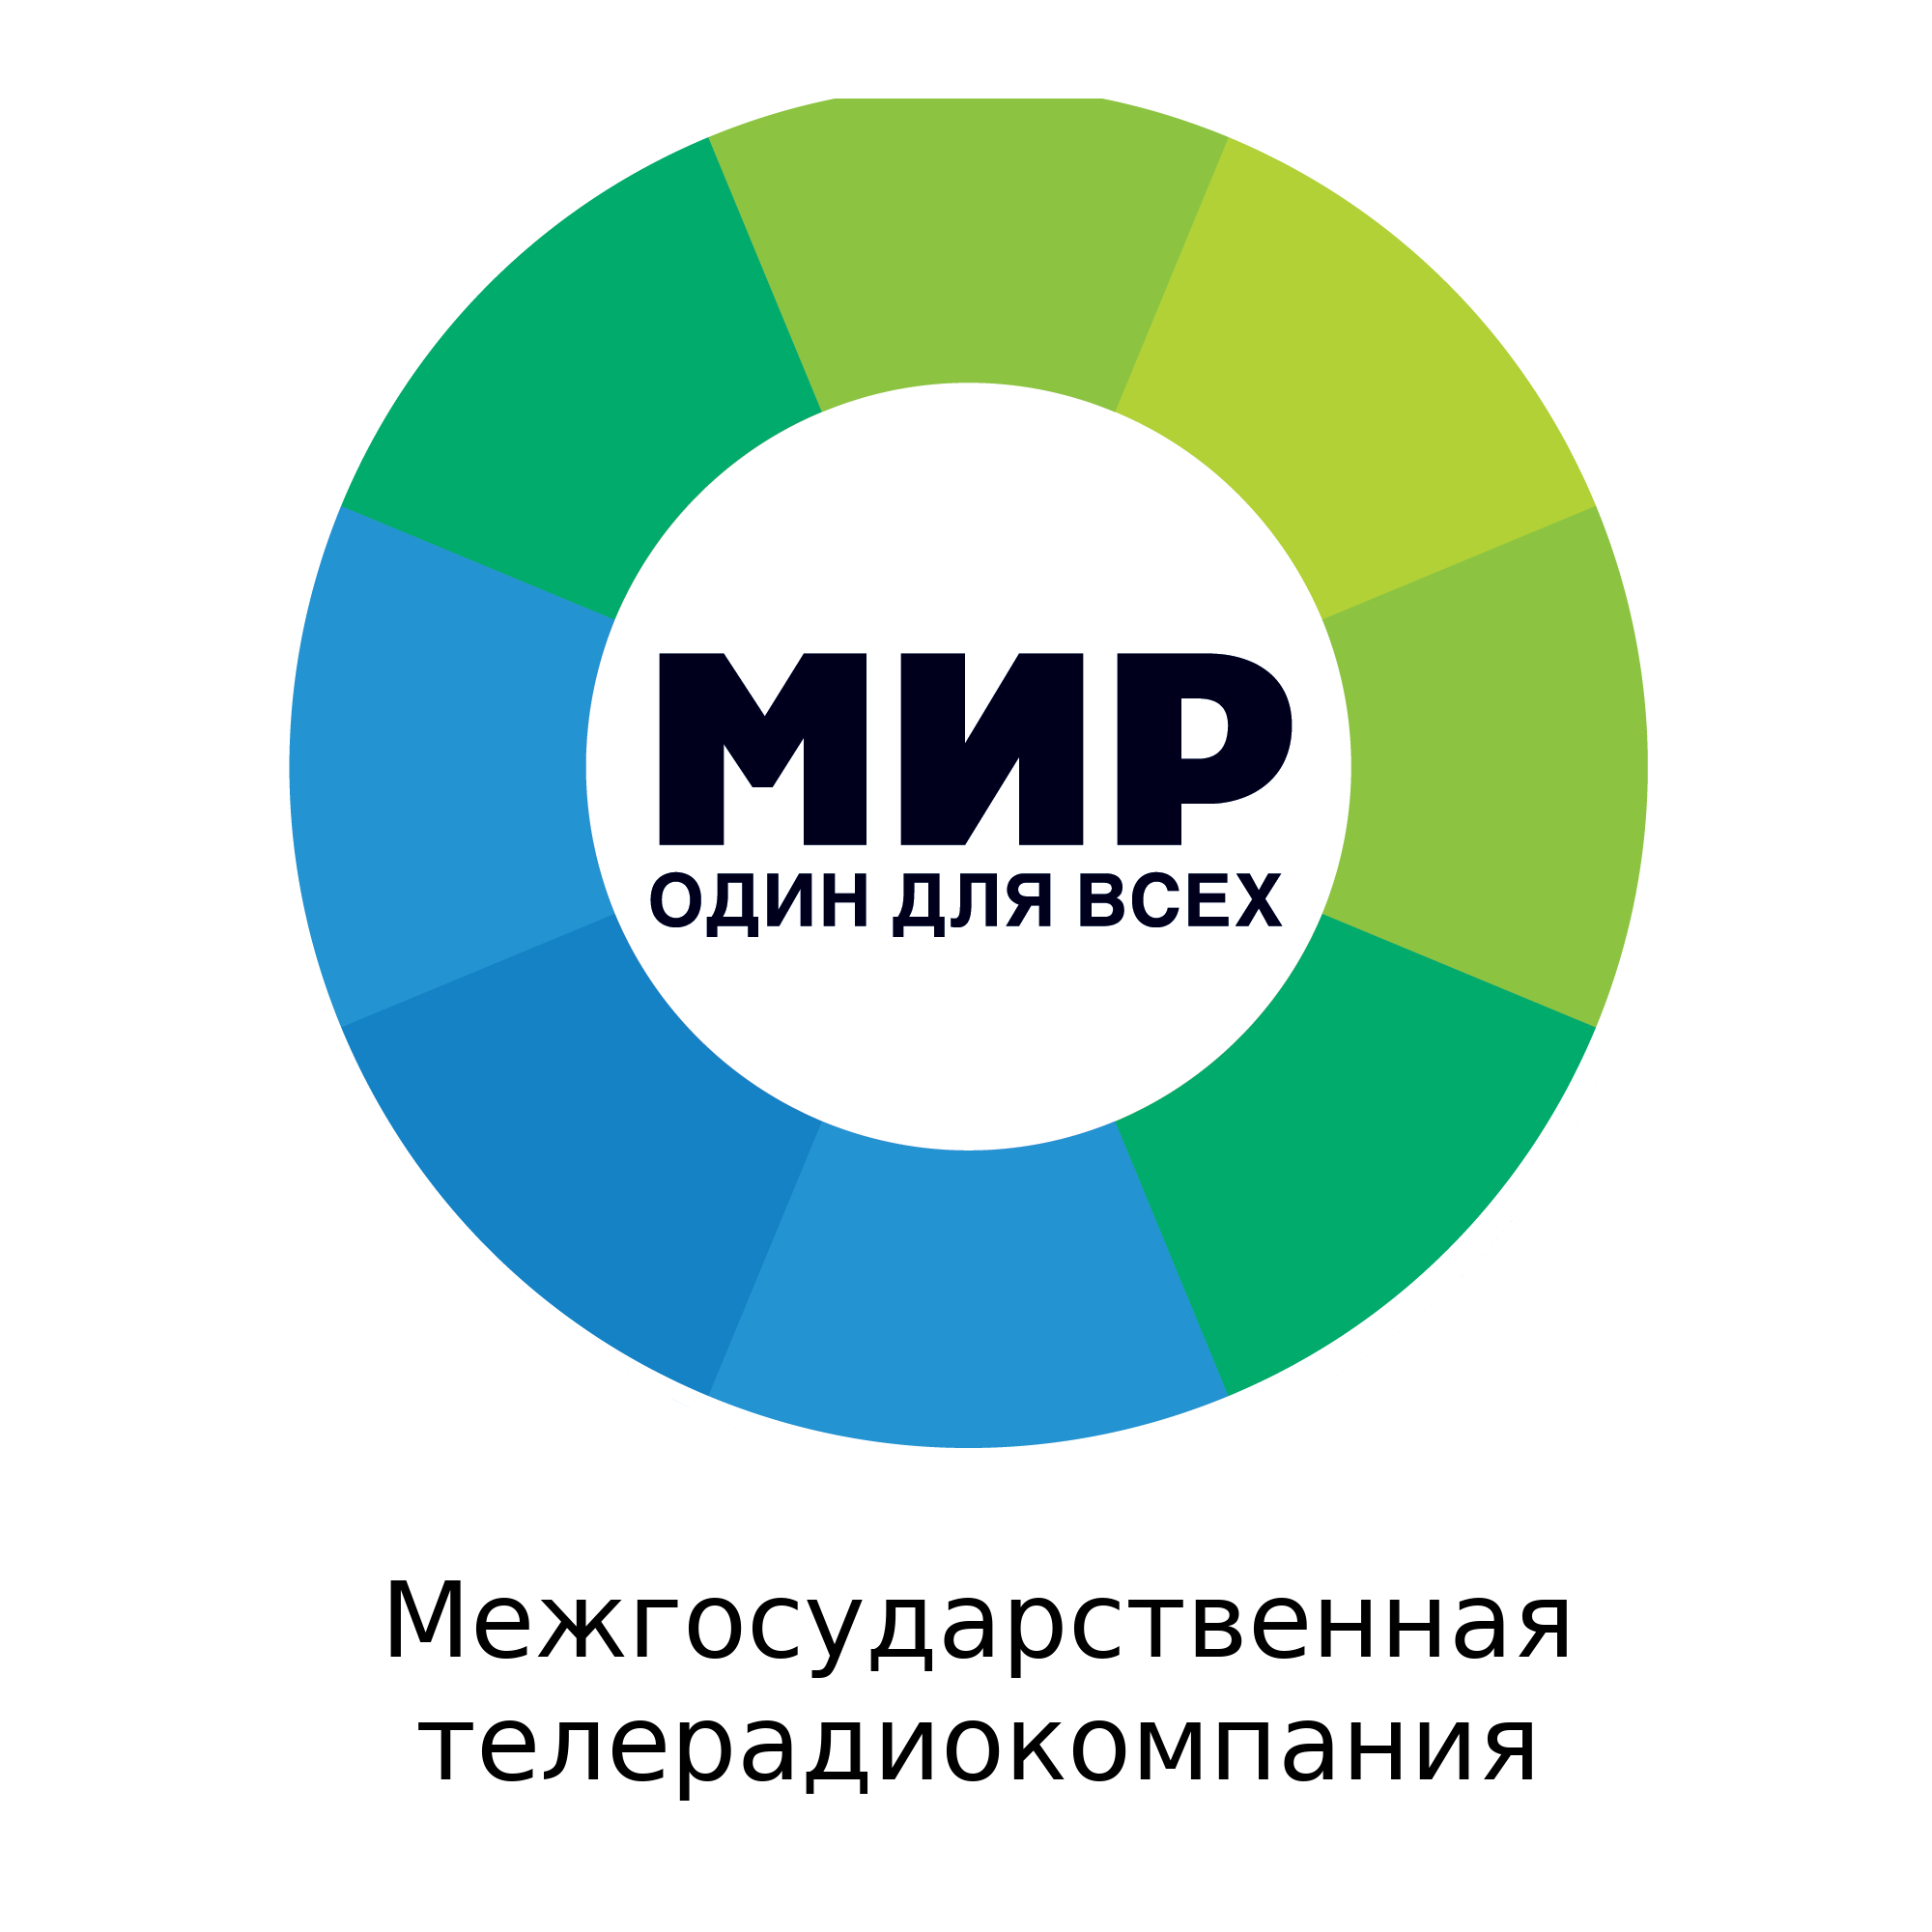 Mir_odin1